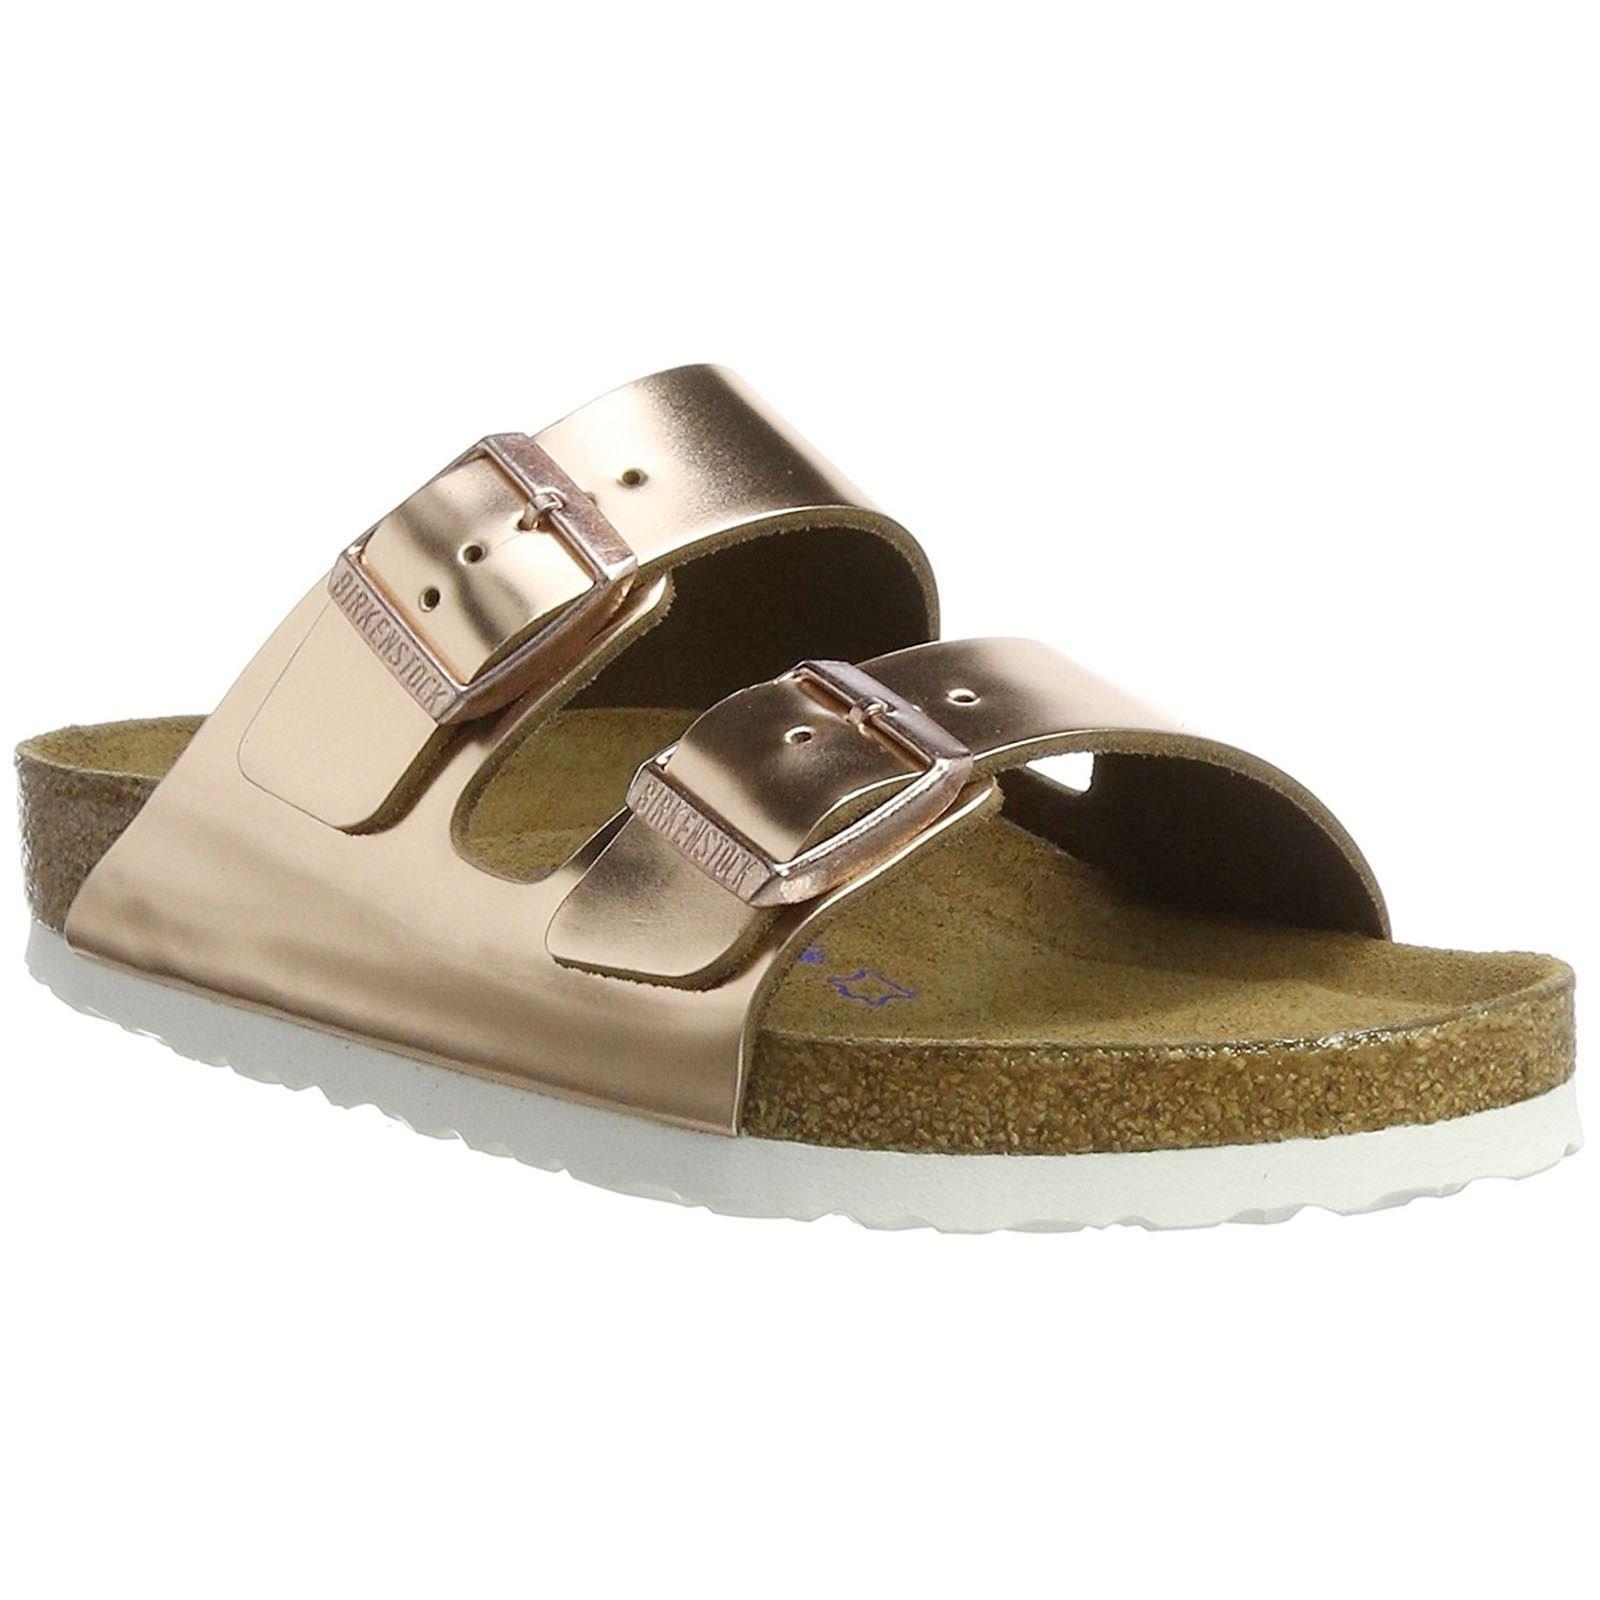 Birkenstock Arizona White Copper Soft Footbed Leather Sandal 39 R (US Women's 8-8.5)